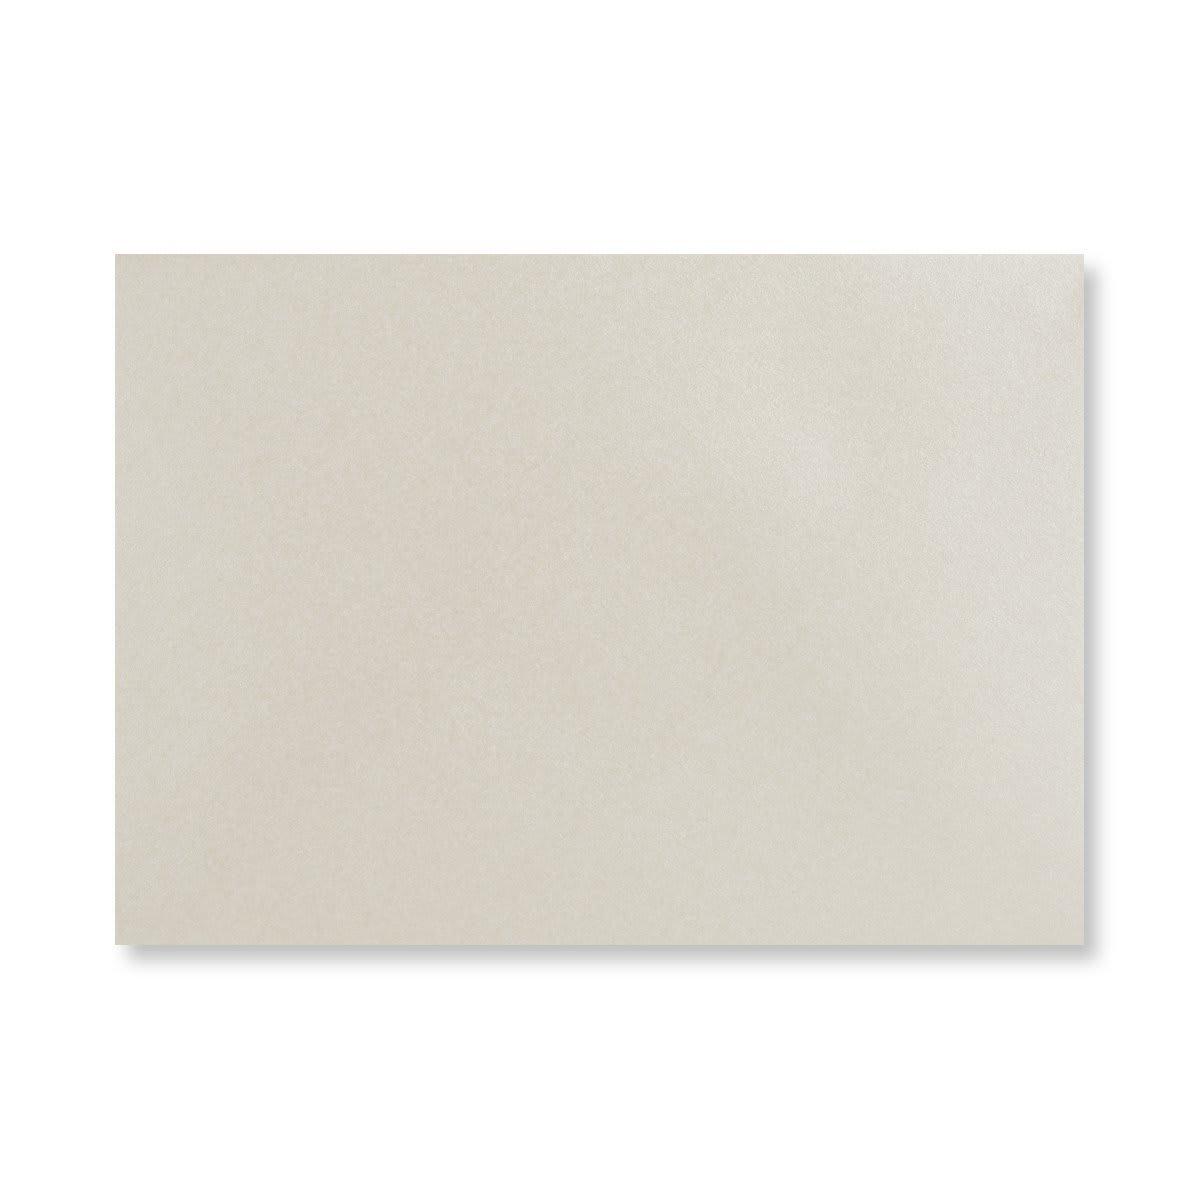 PEARLESCENT OYSTER WHITE 125 x 175 mm ENVELOPES (i6)